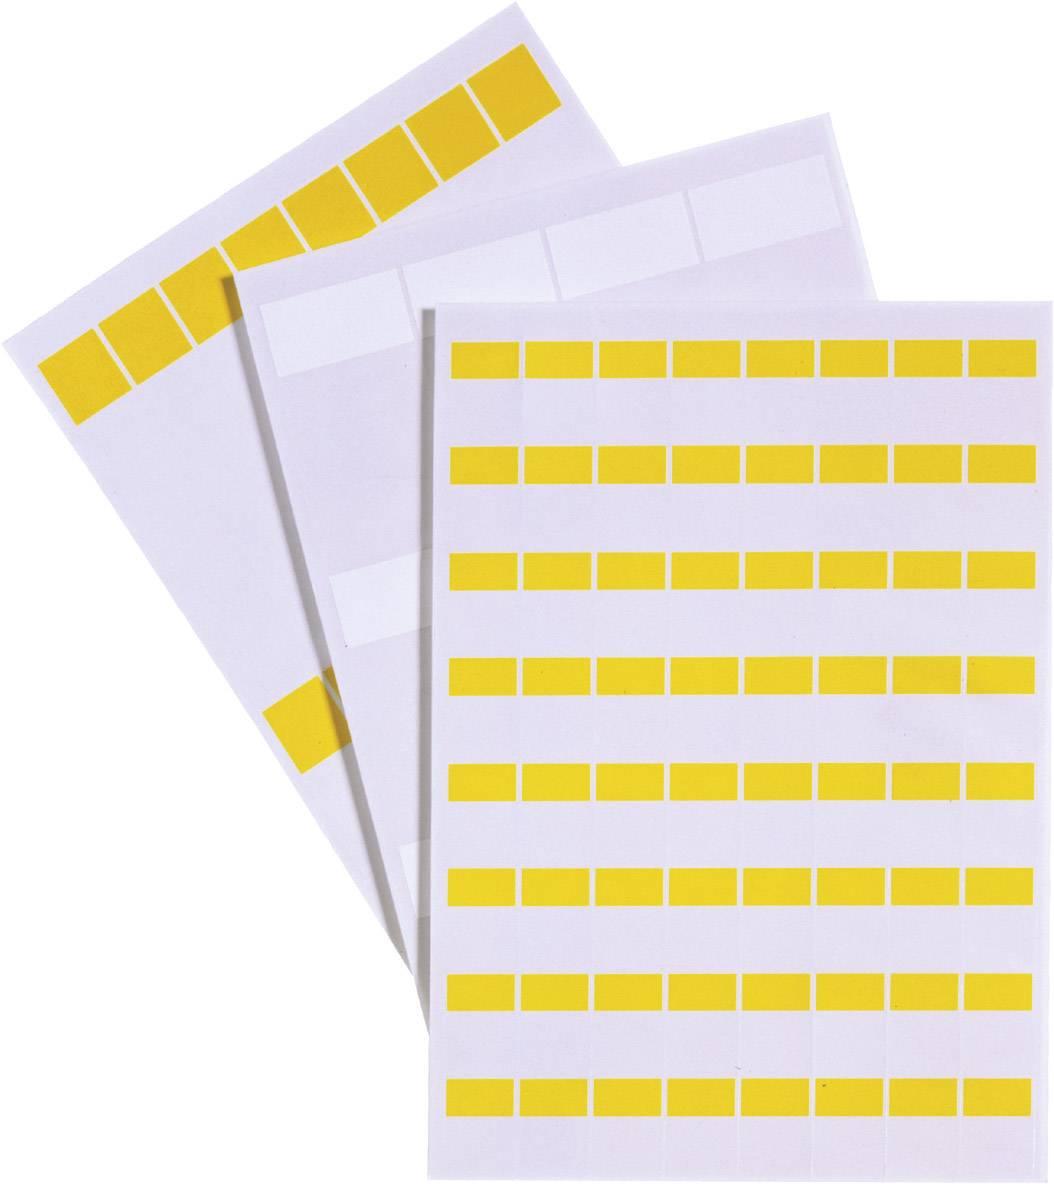 Etikety LappKabel LCK-40 WH (83256147), bílá